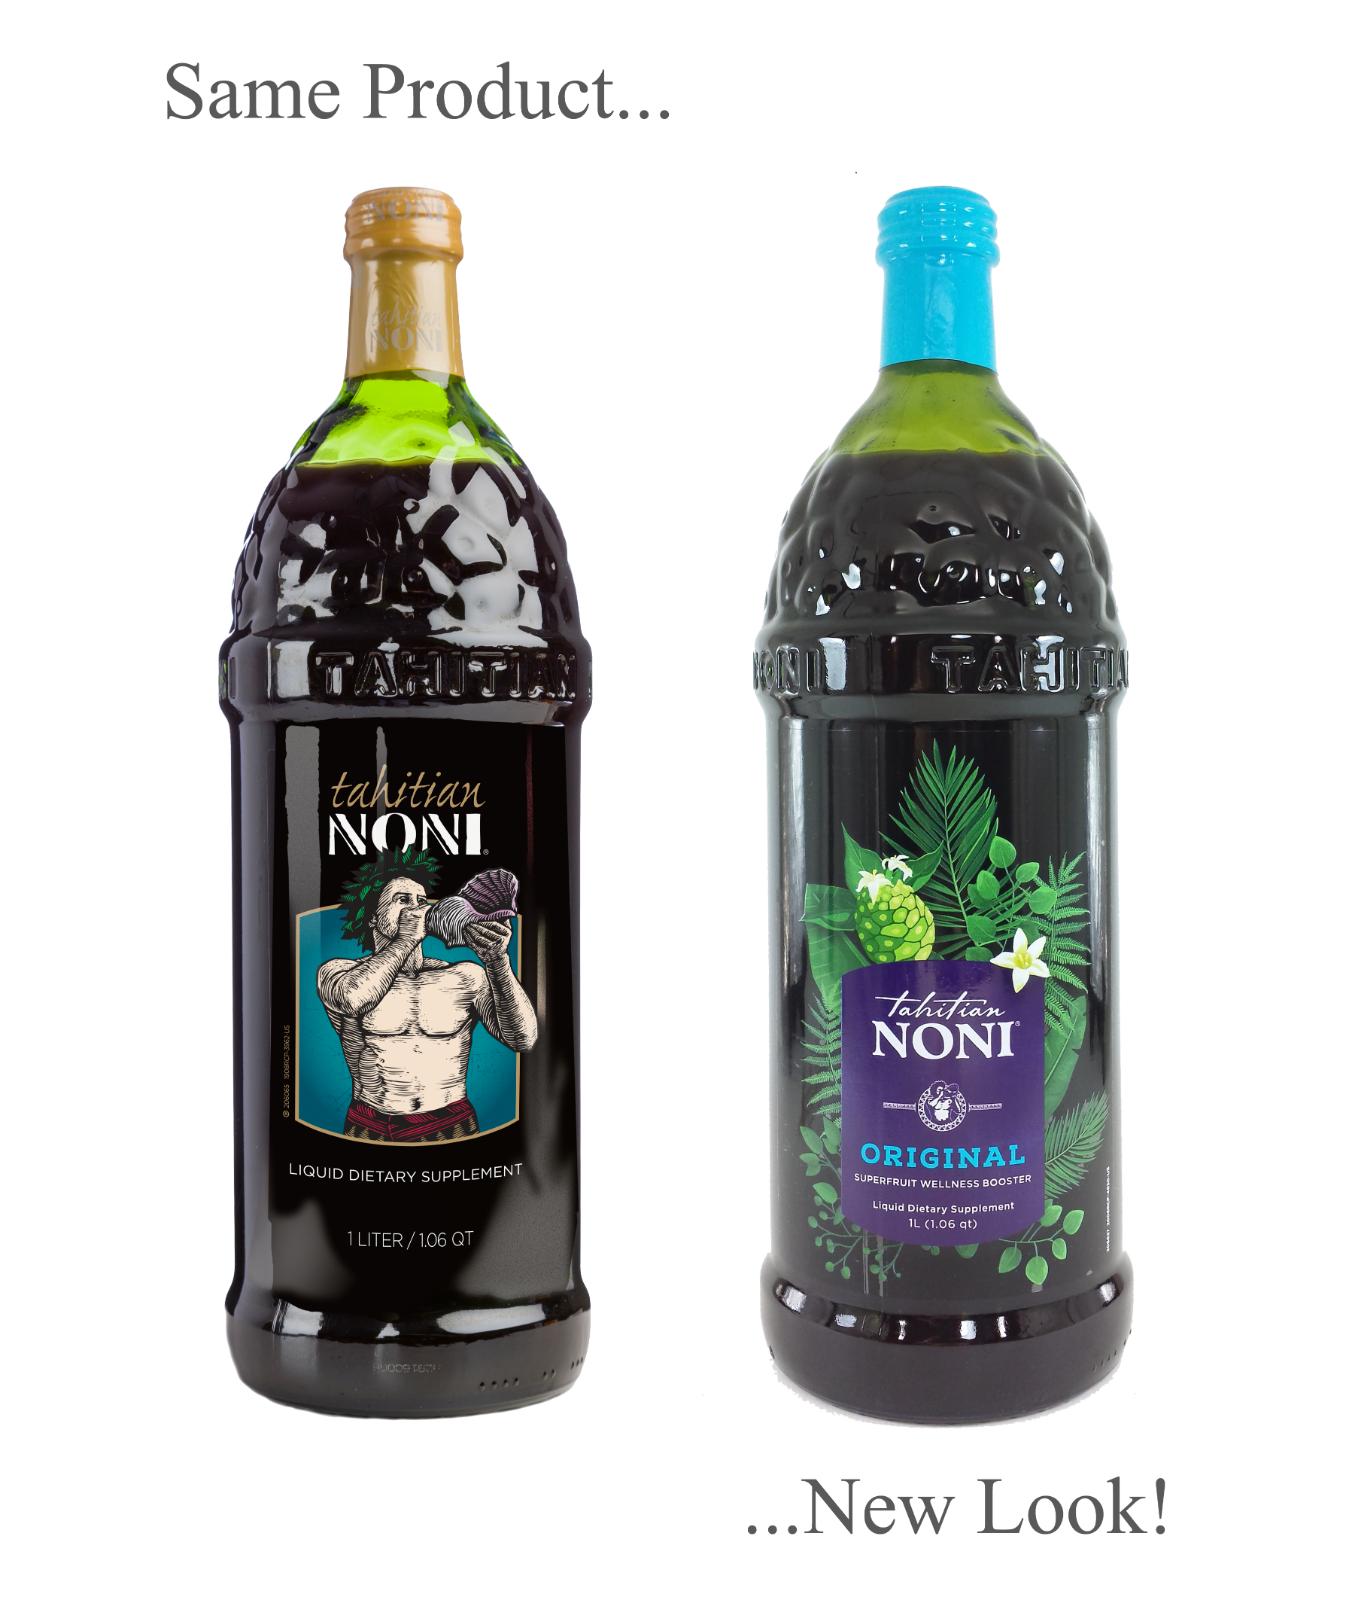 TAHITIAN NONI ® Juice - Original By Morinda - *Brand New Single Bottle*  1